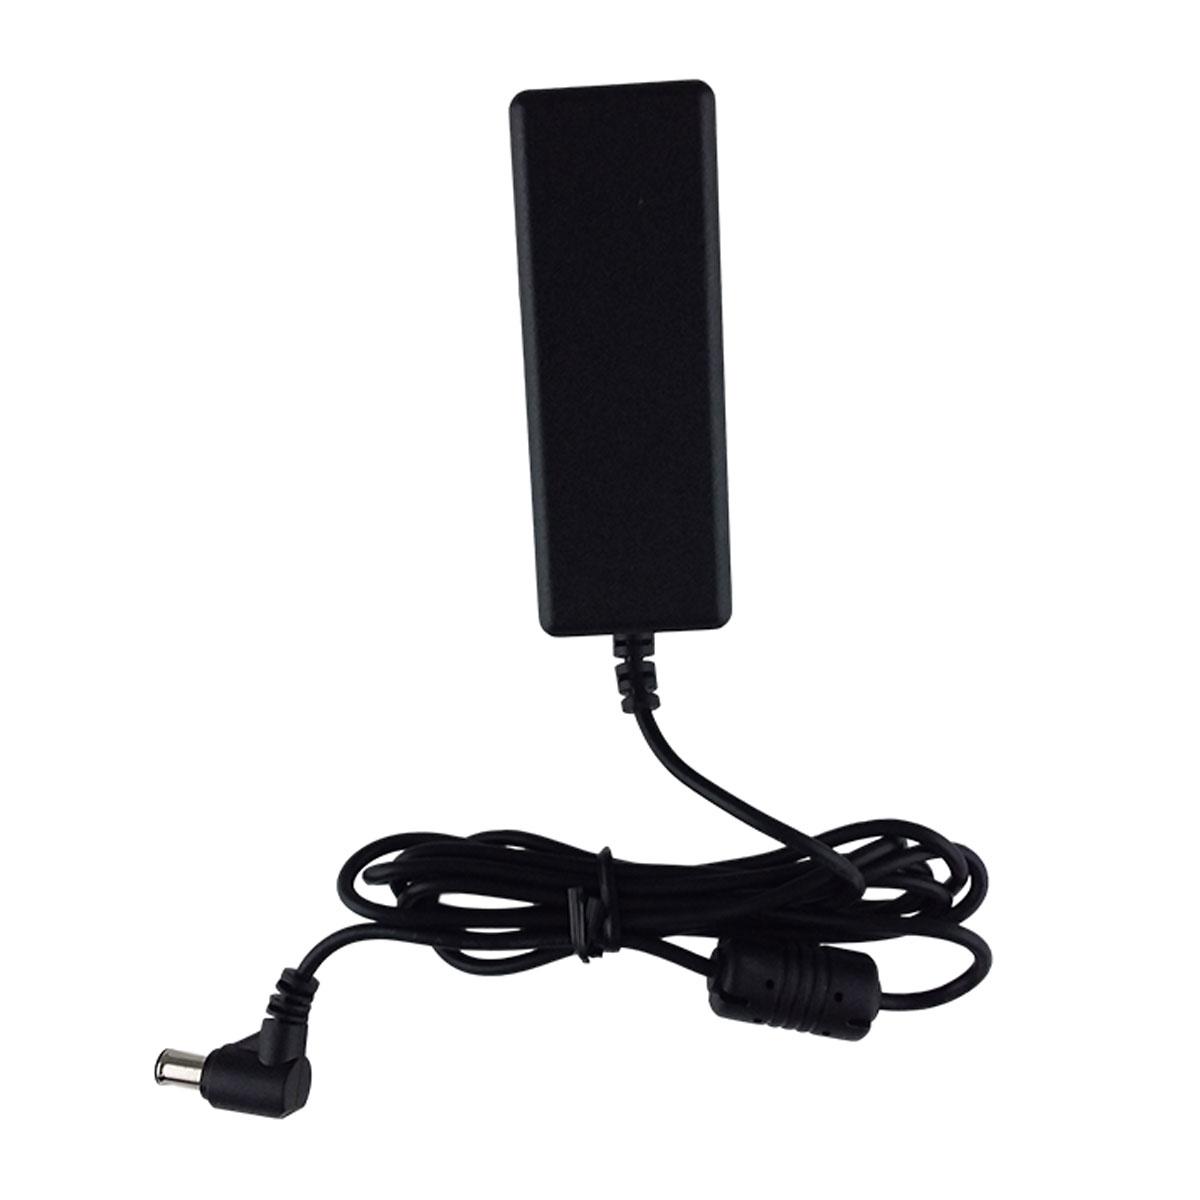 Original LG LCAP16B-A Monitor Power Adapter Cable Cord Box Adaptor